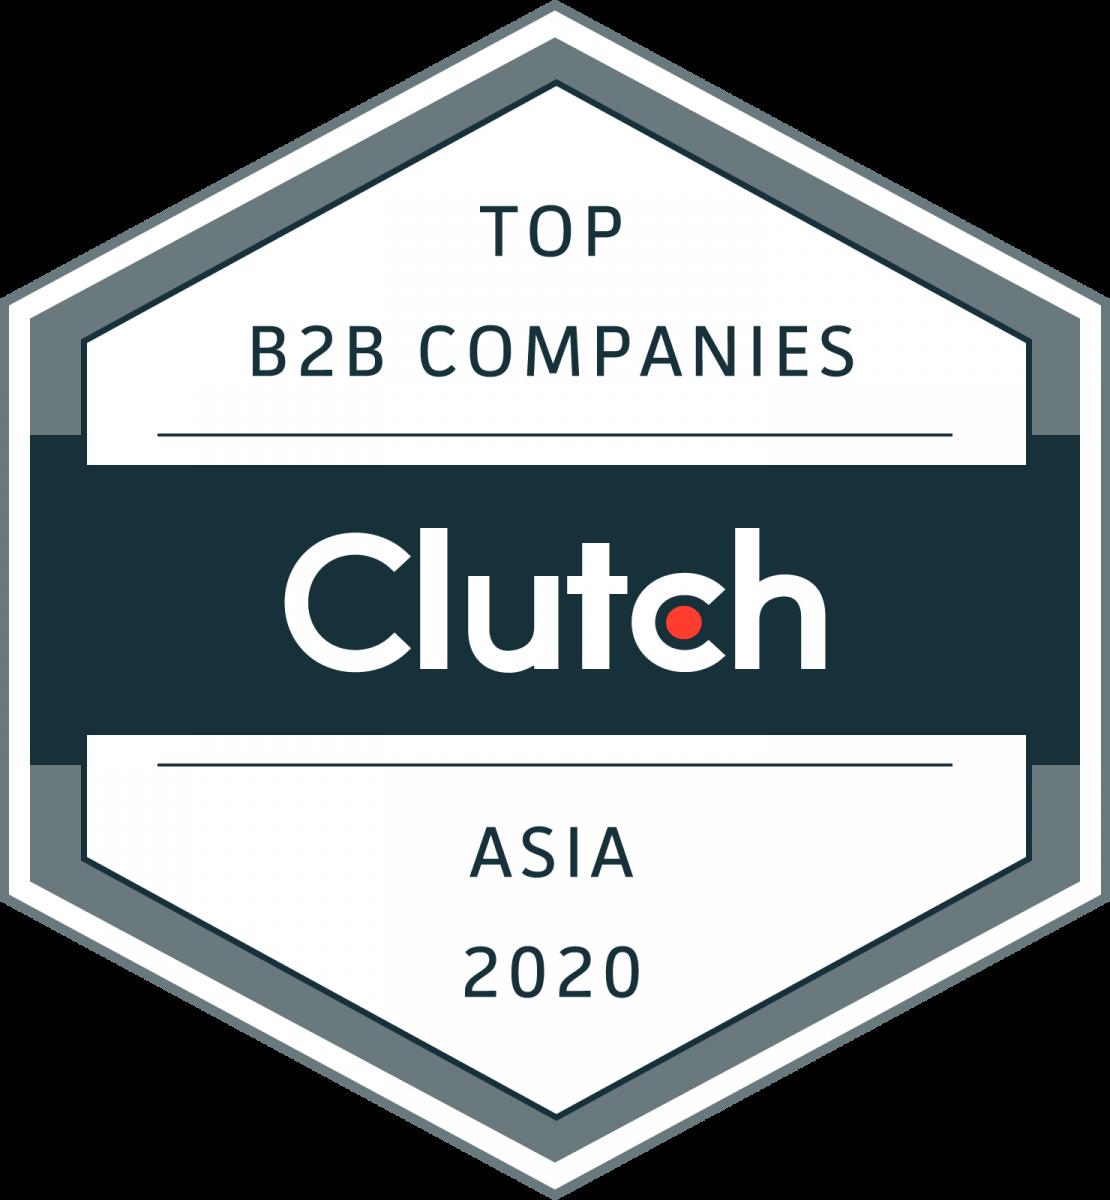 Asia 2020 B2B leaders